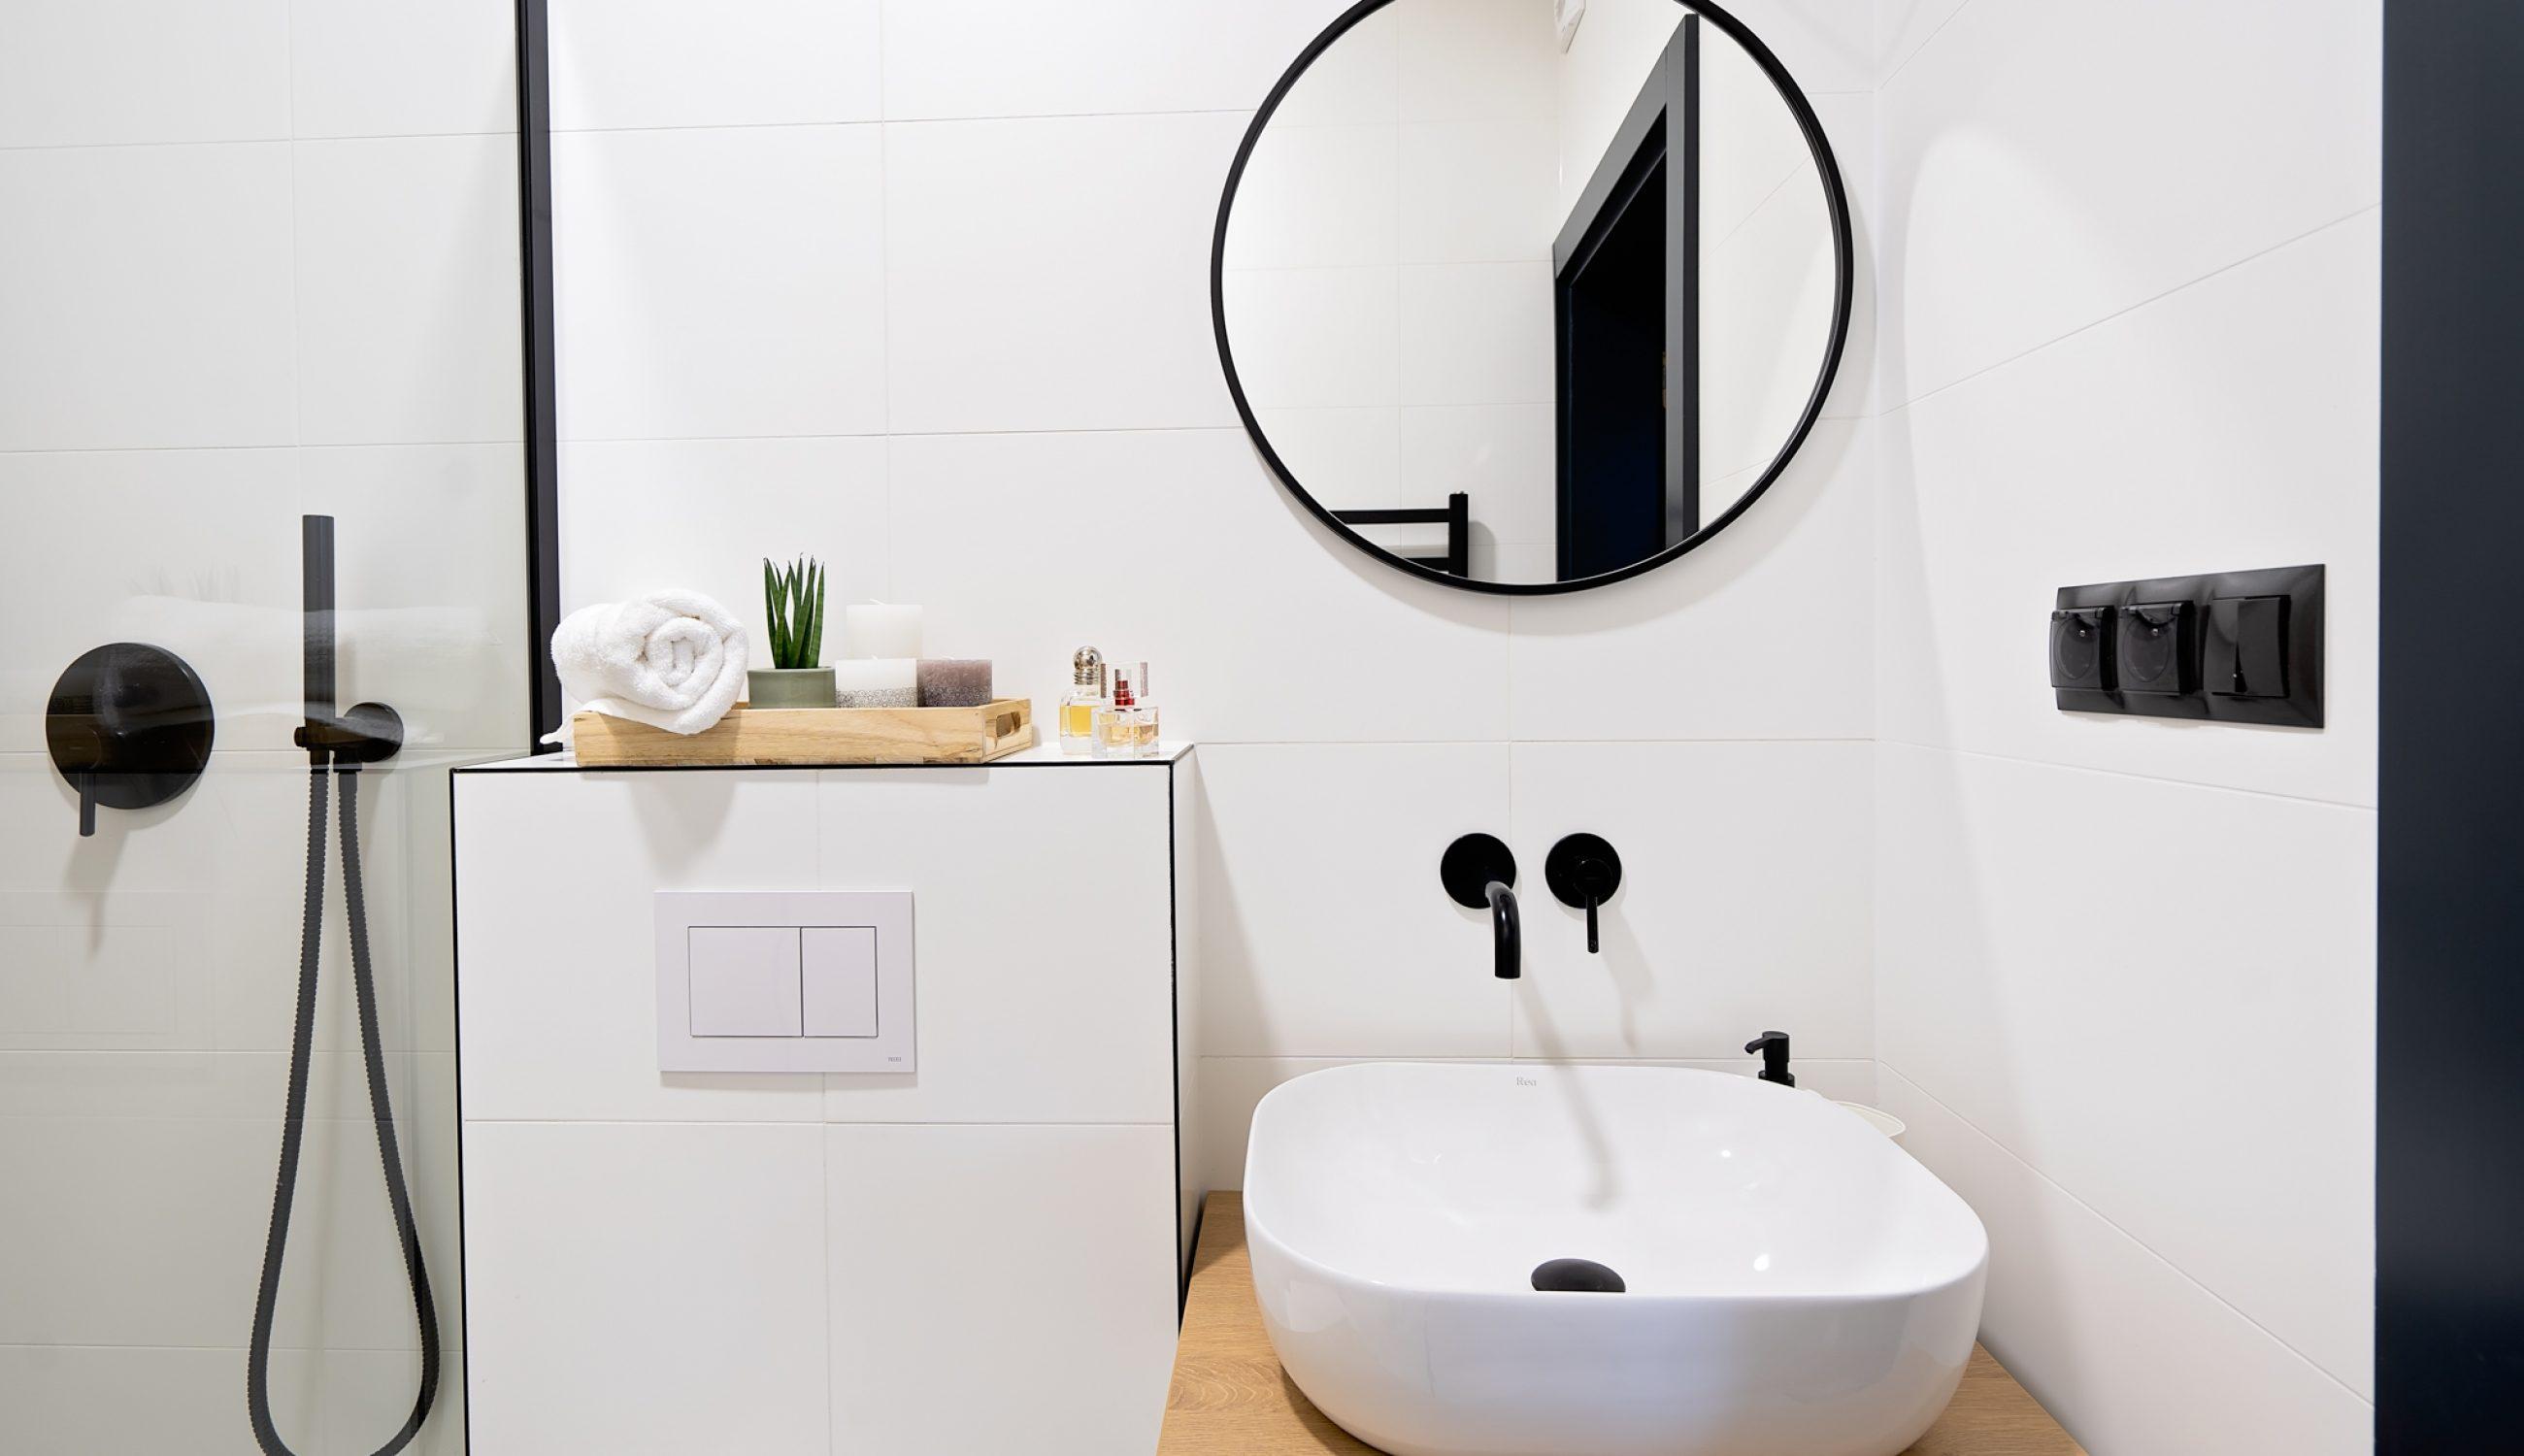 Apartamenty NOVA BIAŁKA Białka Tatrzańska apartament 1 łazienka 2